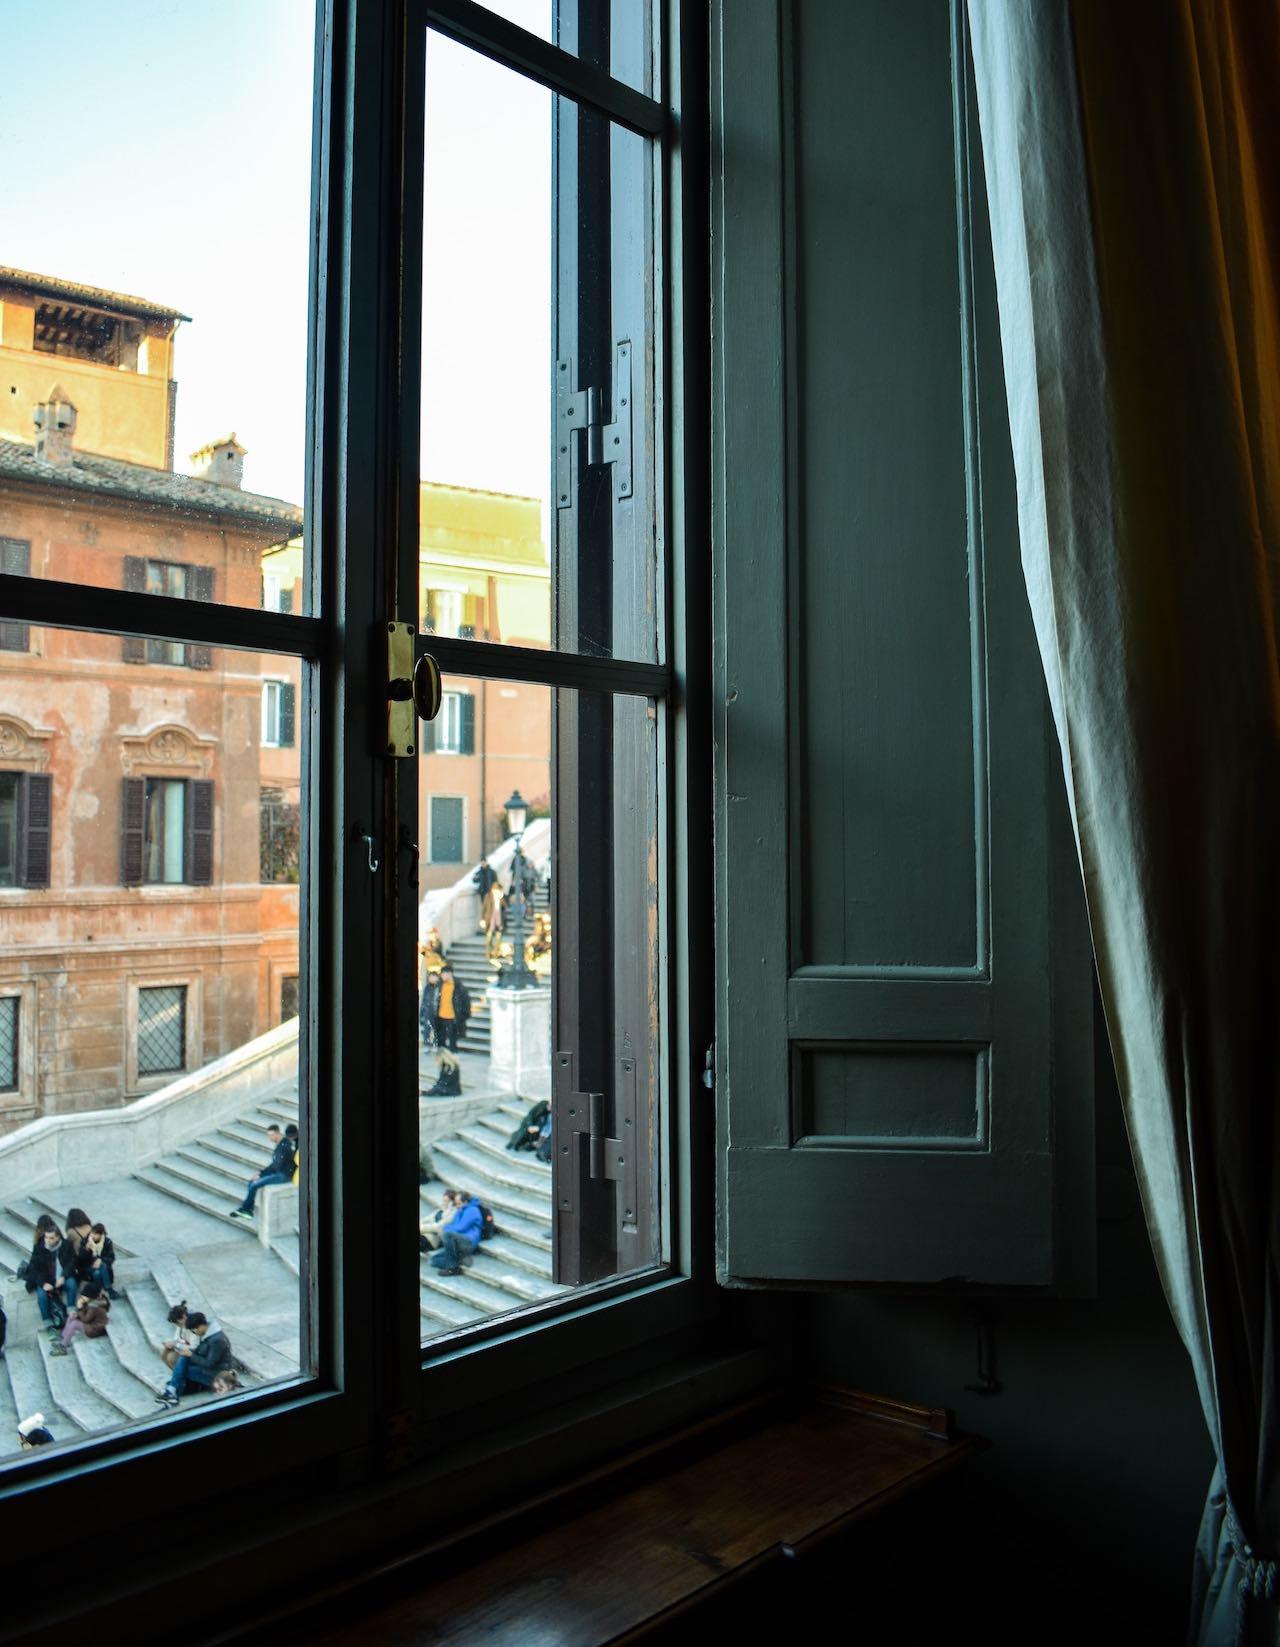 Piazza di Spagna | Photo: Aleyna Rentz